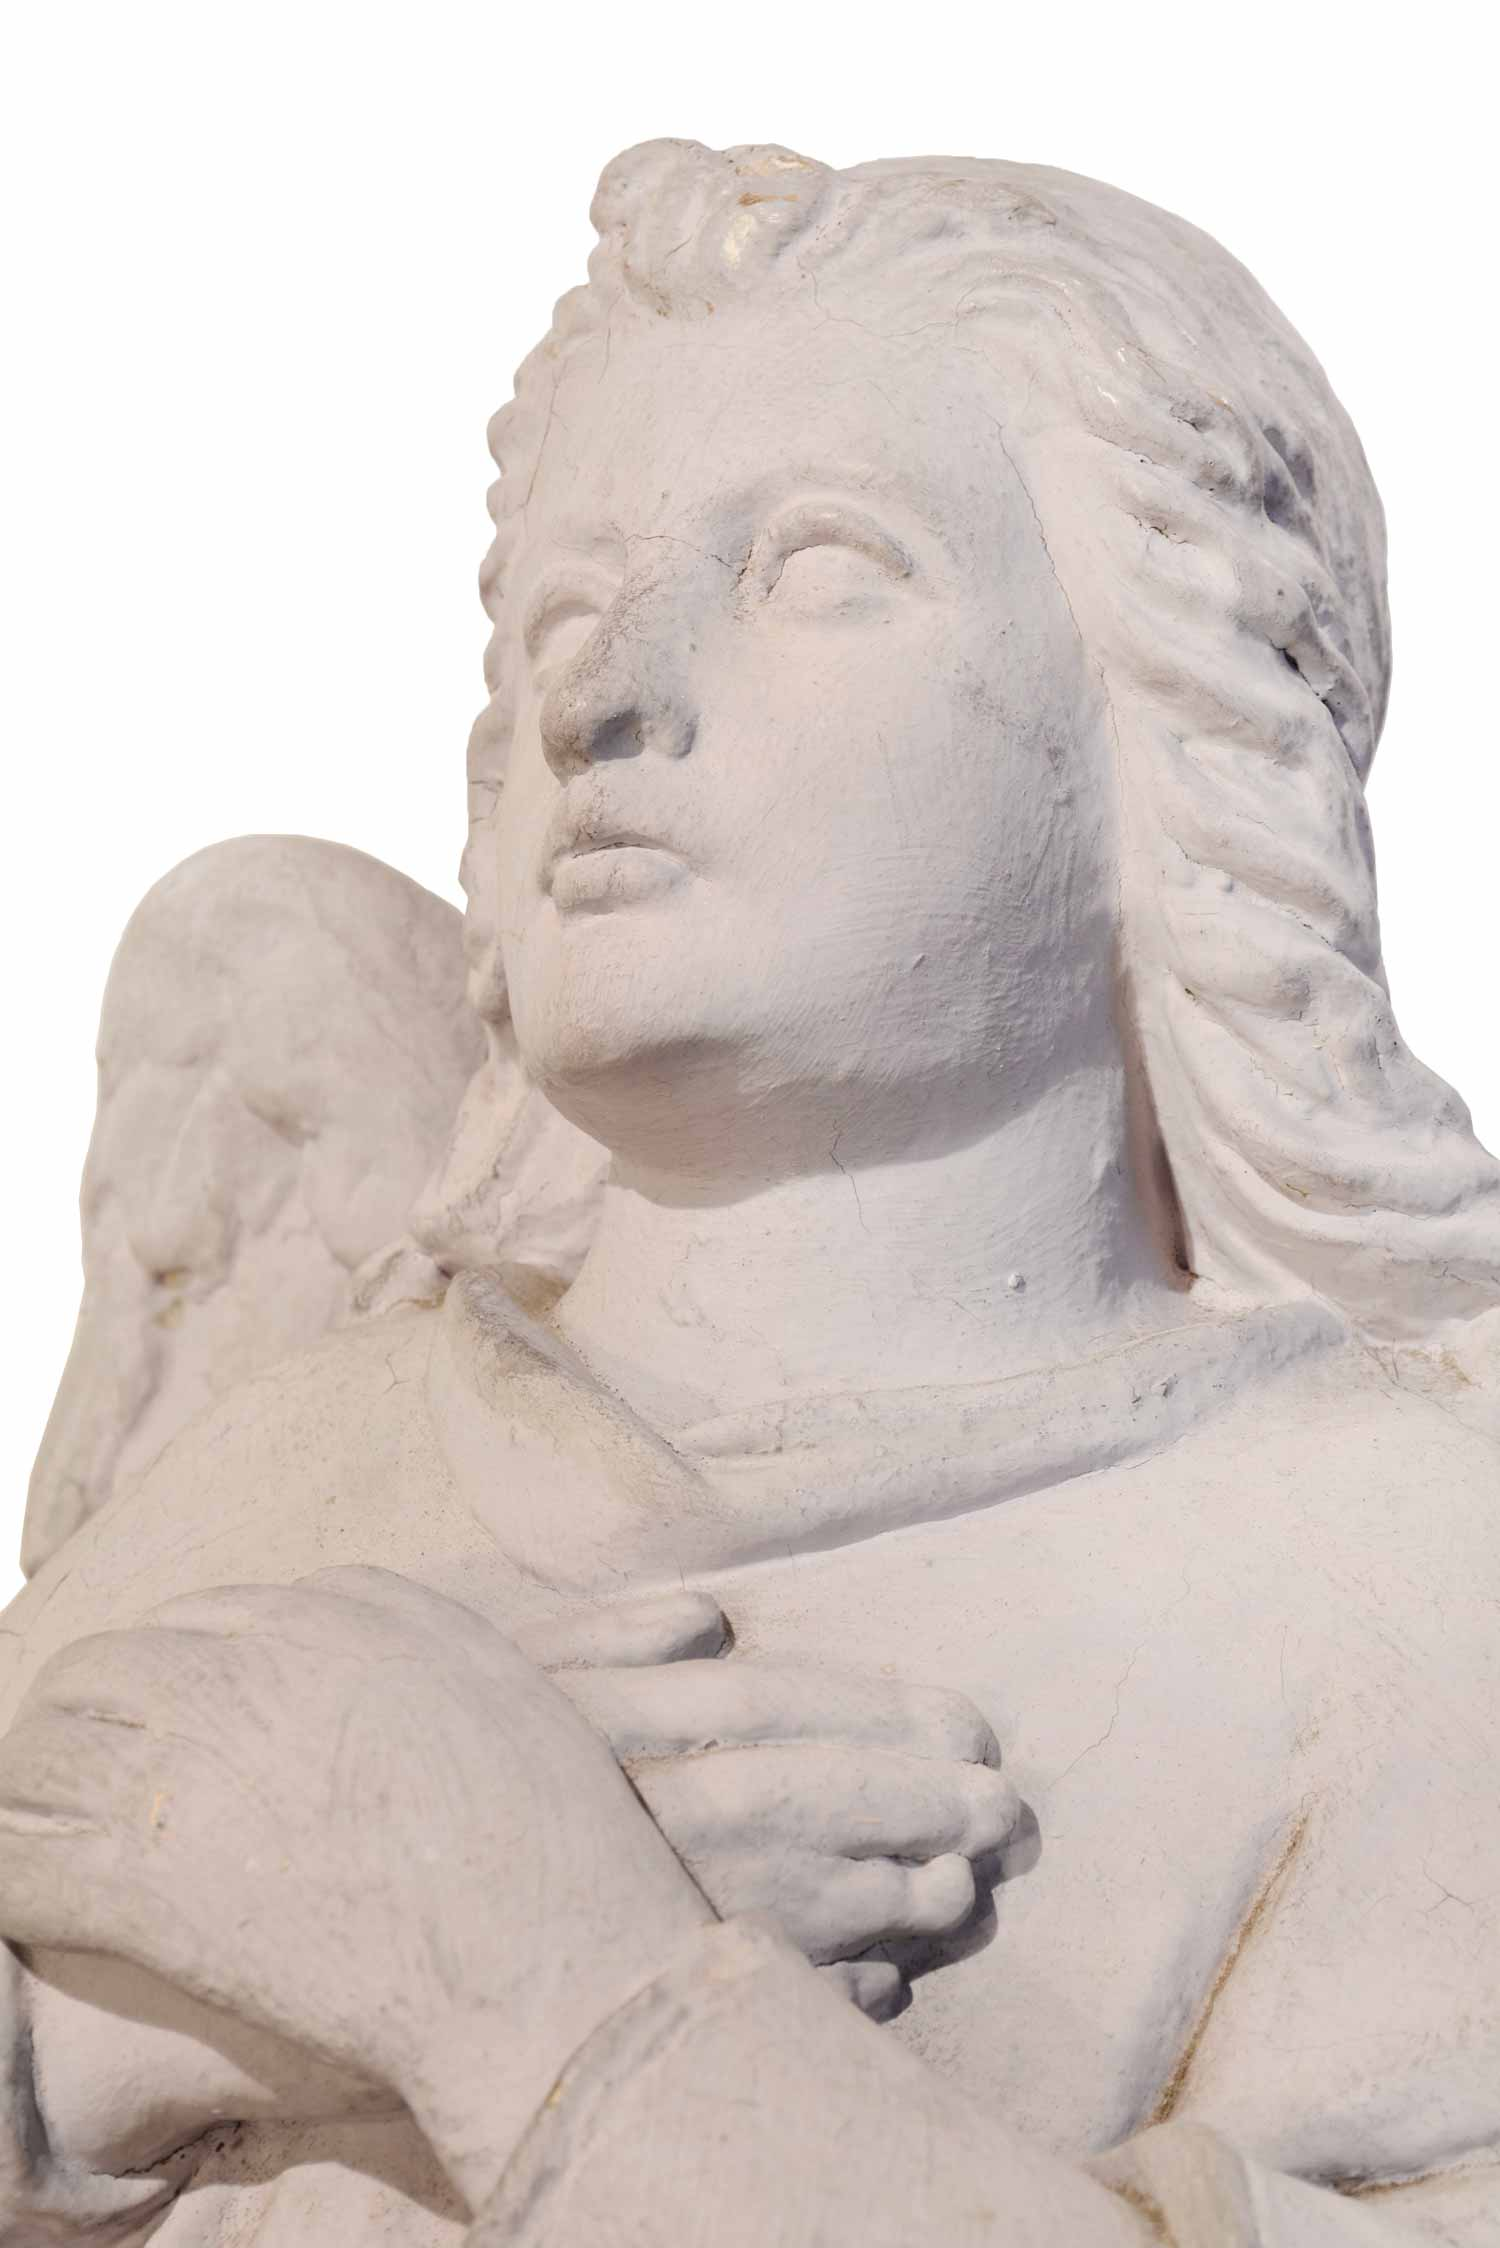 45857-angel-bust-face-detail.jpg